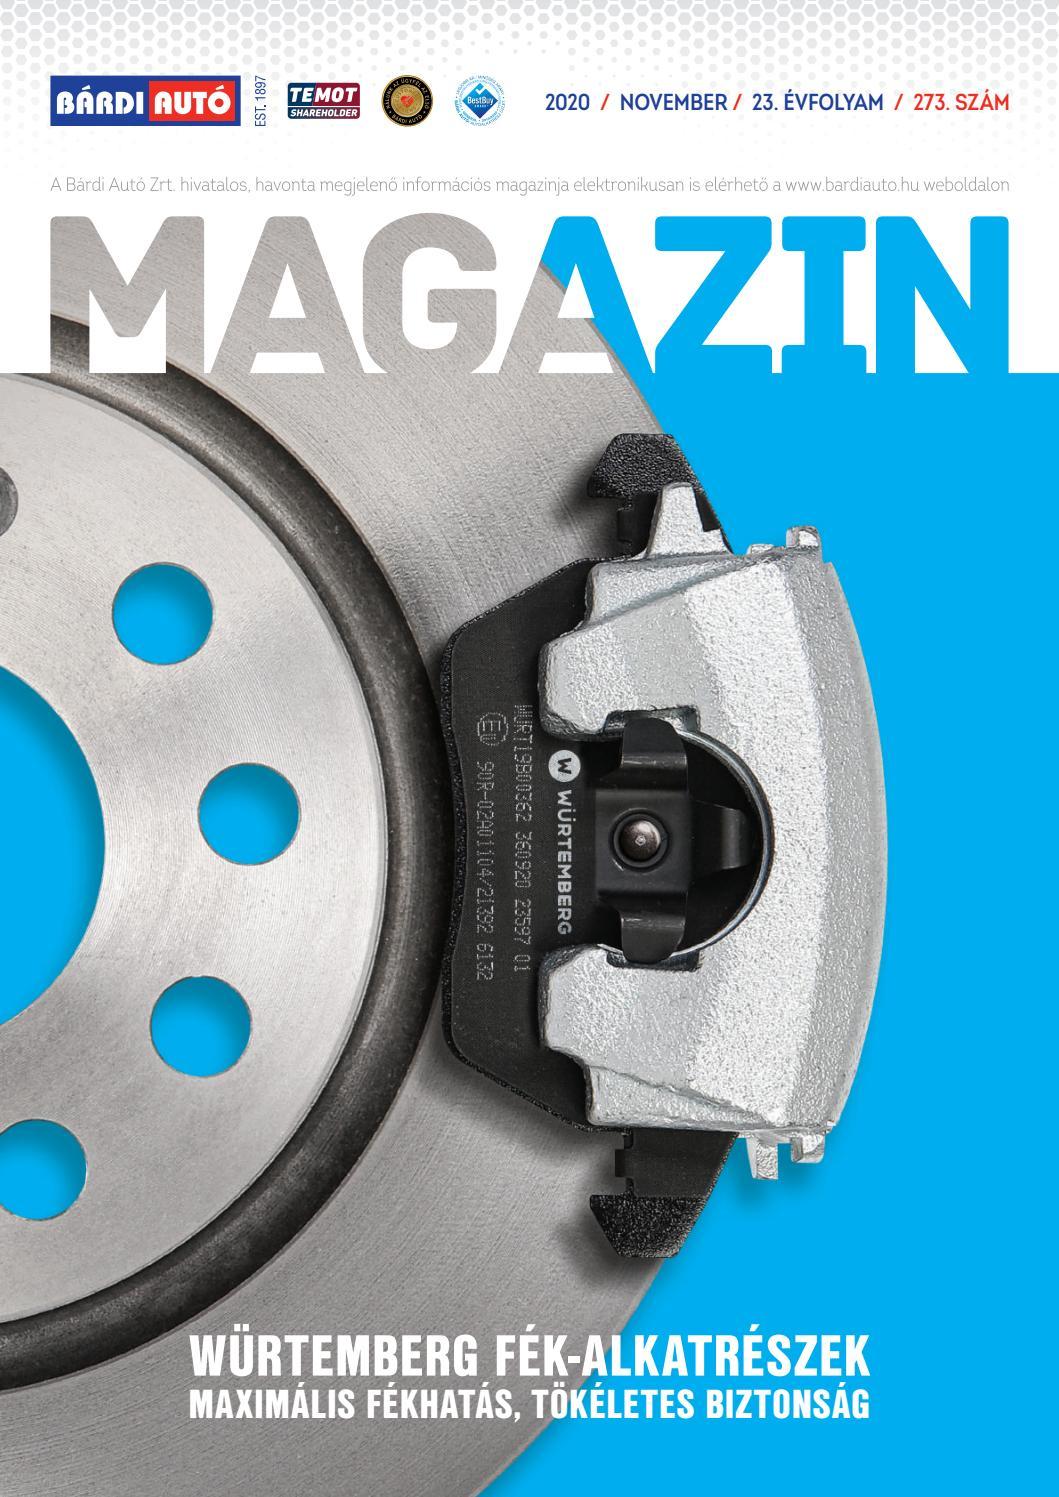 Bardi Auto Magazin Autozz Biztonsagban A Premium Wurtemberg Fek Alkatreszekkel By Bardiauto Issuu